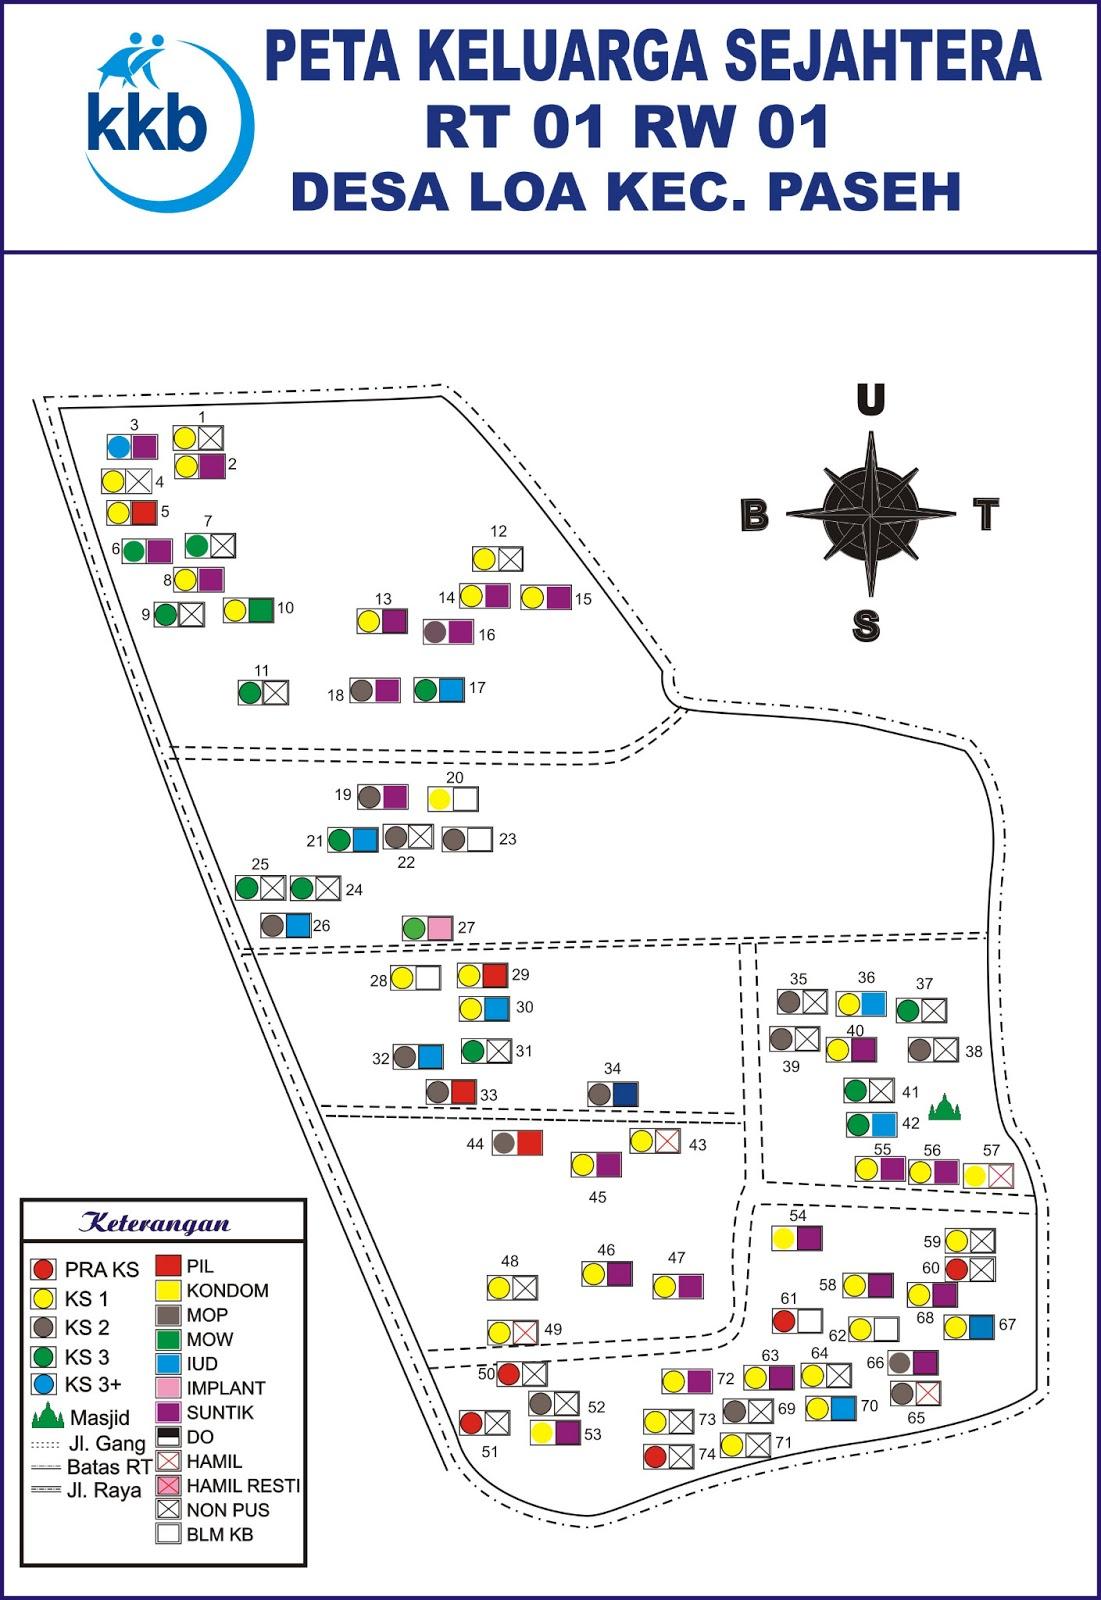 Pembuatan Peta Keluarga di Kecamatan Paseh Kabupaten ...